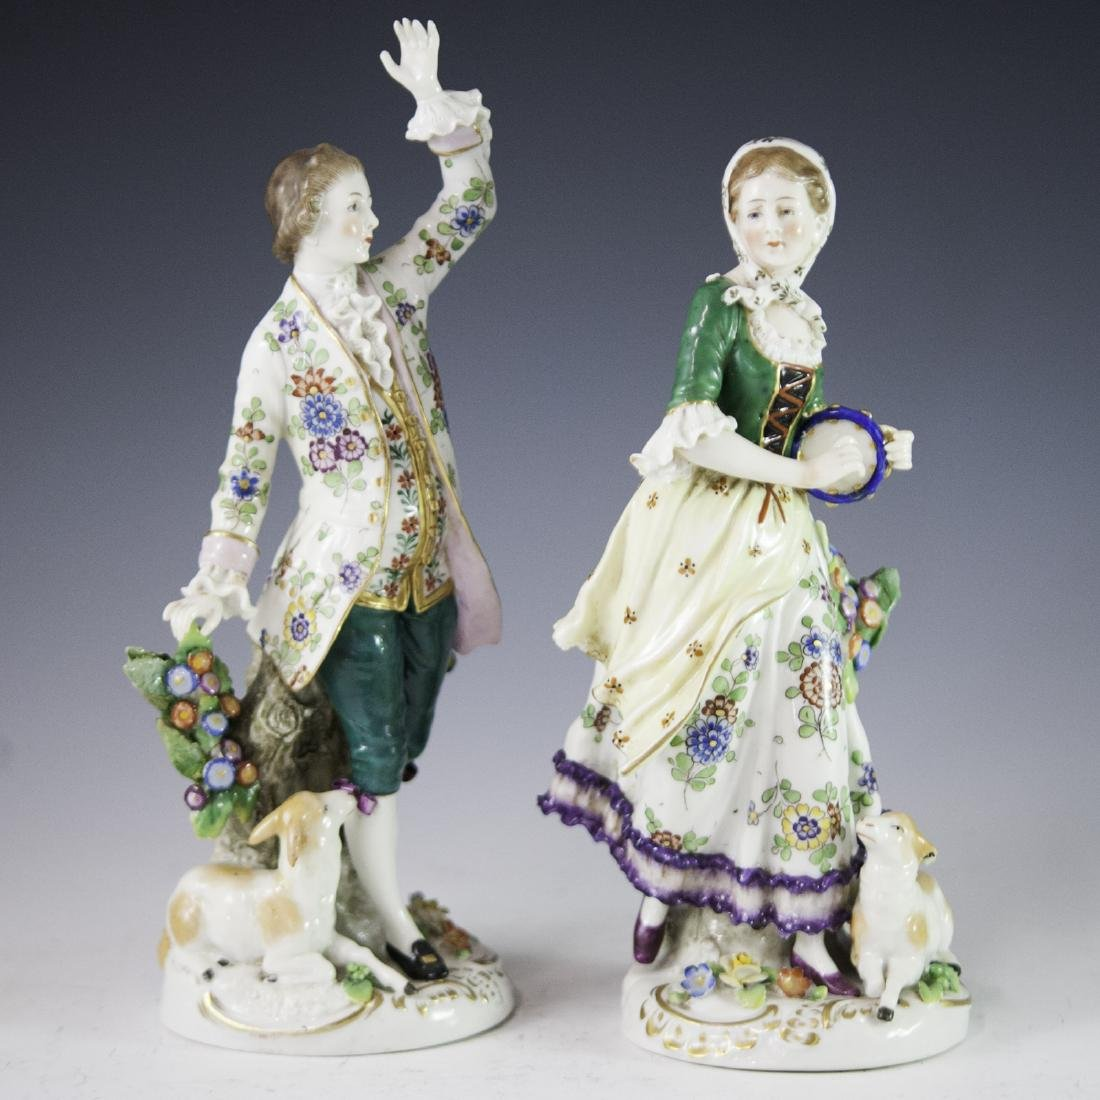 Chelsea Style Porcelain Figurines - 5